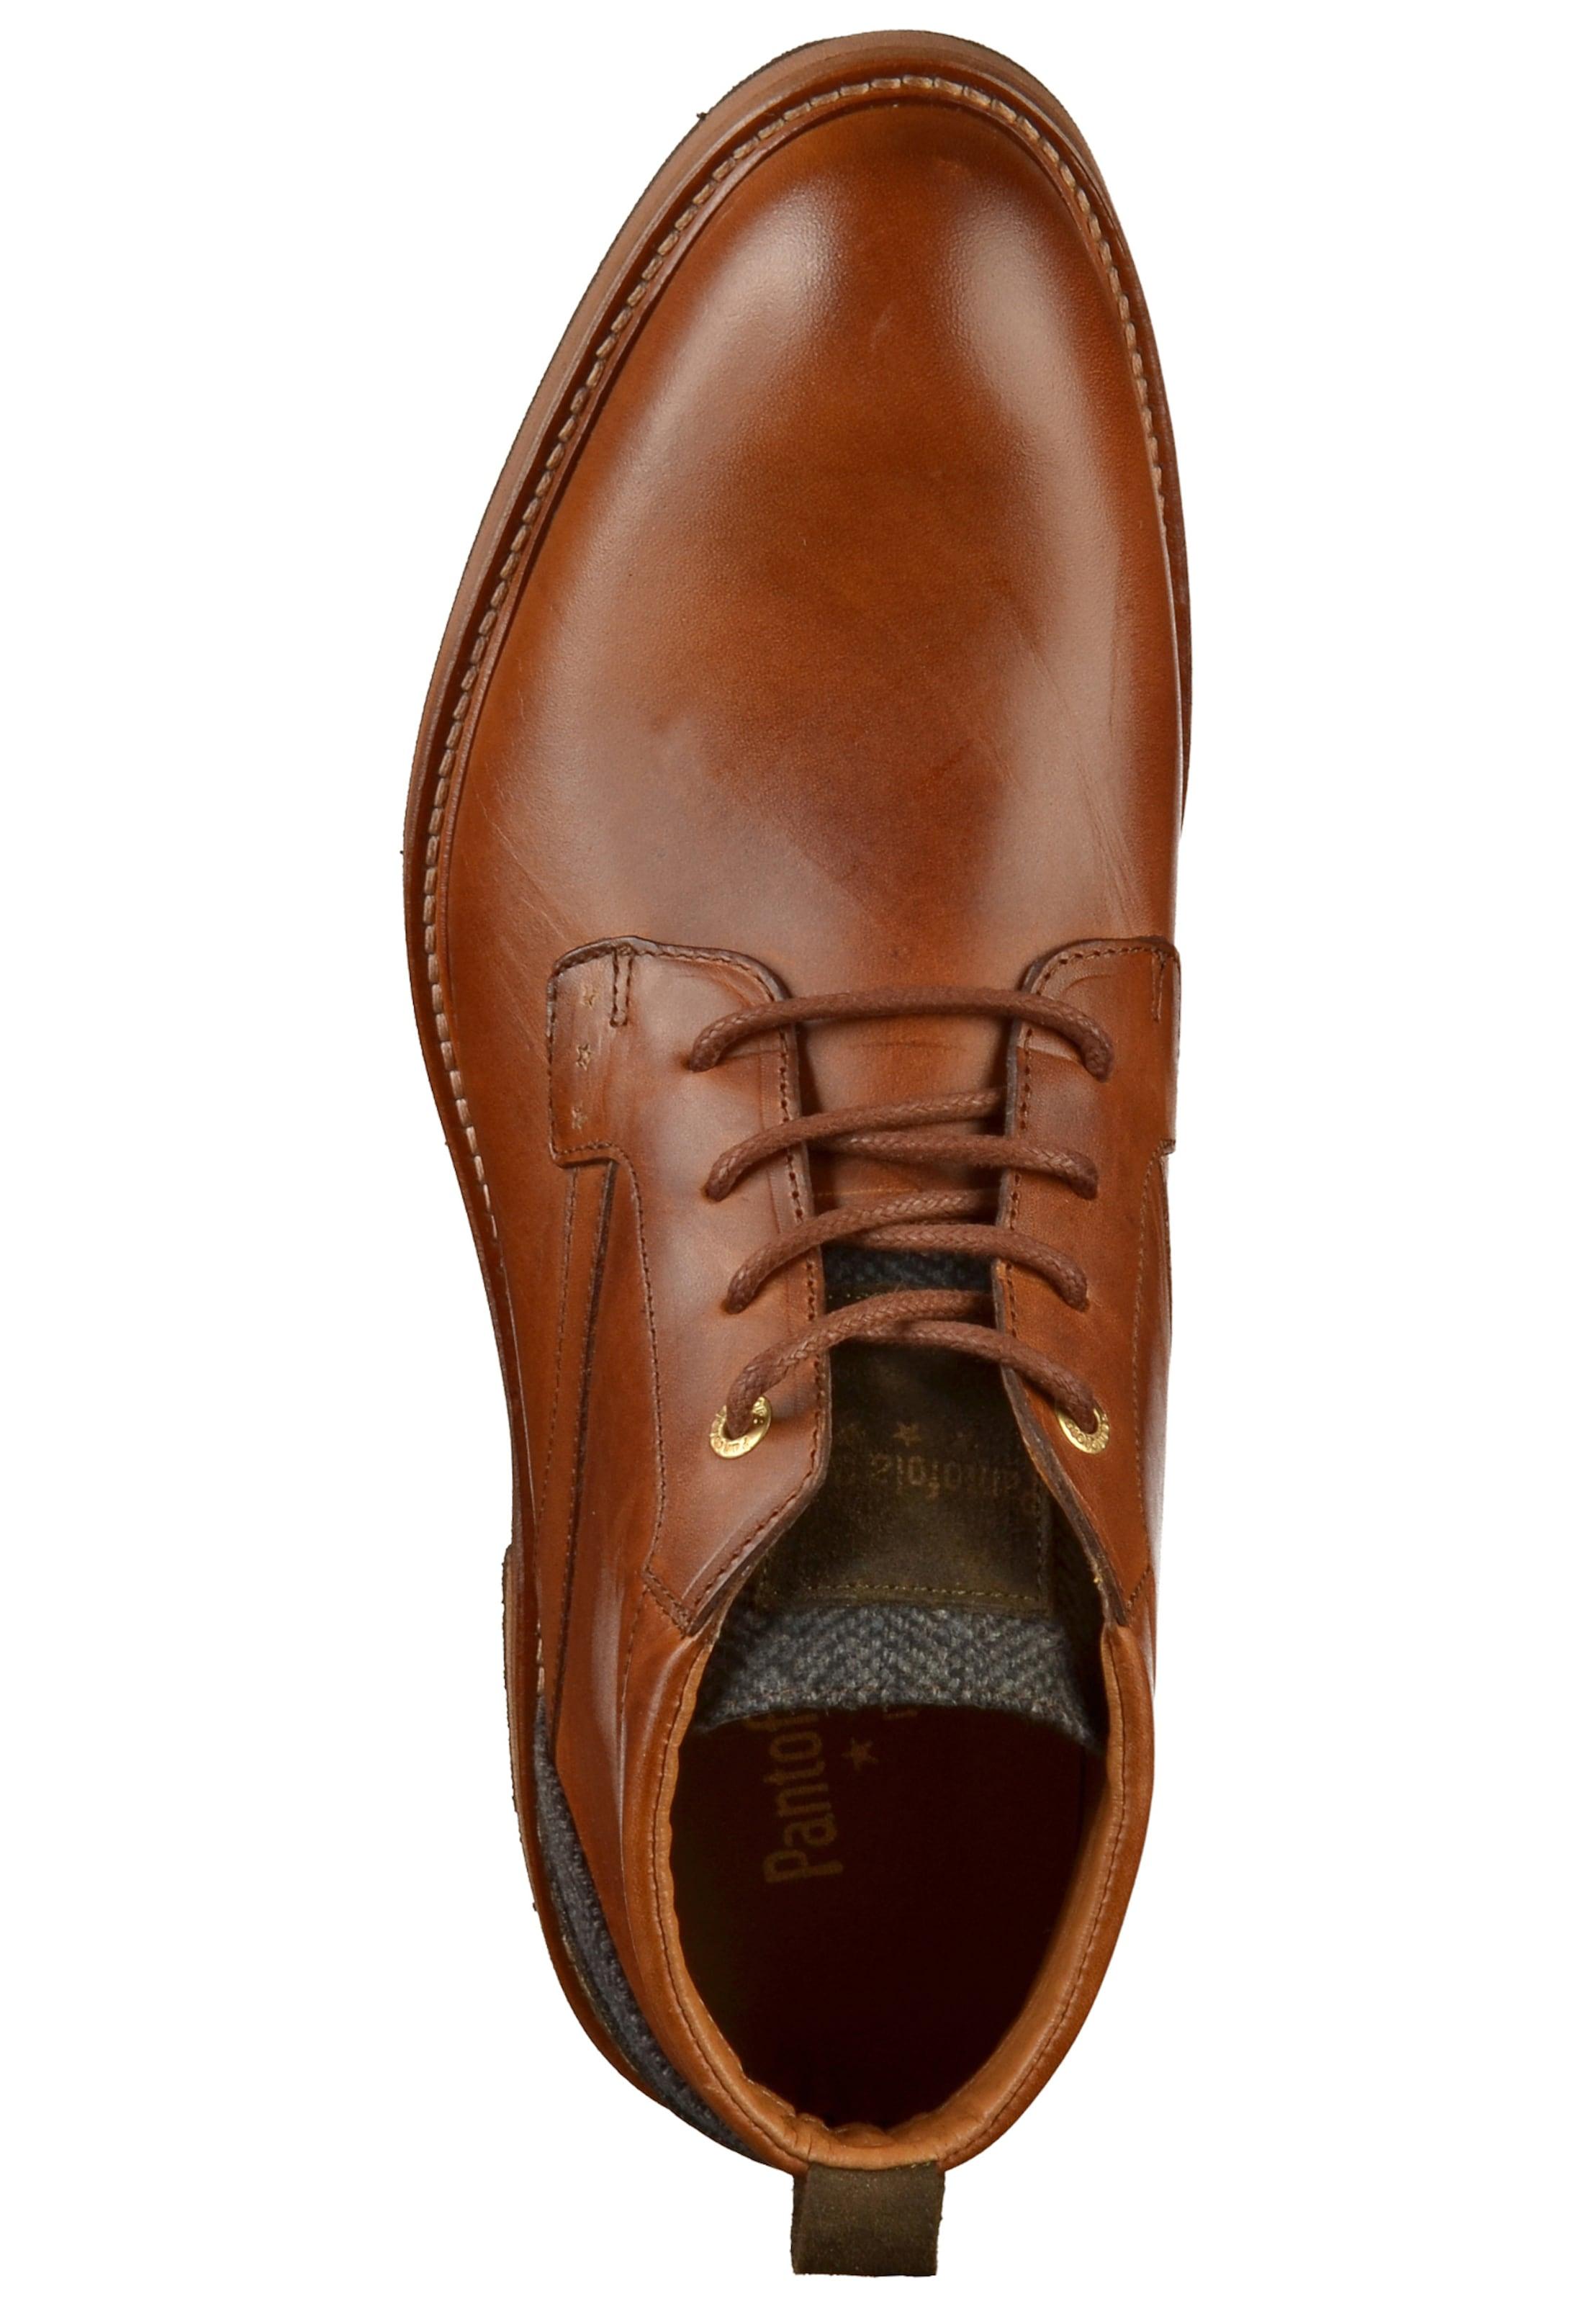 Pantofola In D'oro Businessschuhe Pantofola Cognac D'oro In Businessschuhe Pantofola In Businessschuhe D'oro Cognac deorWxCB